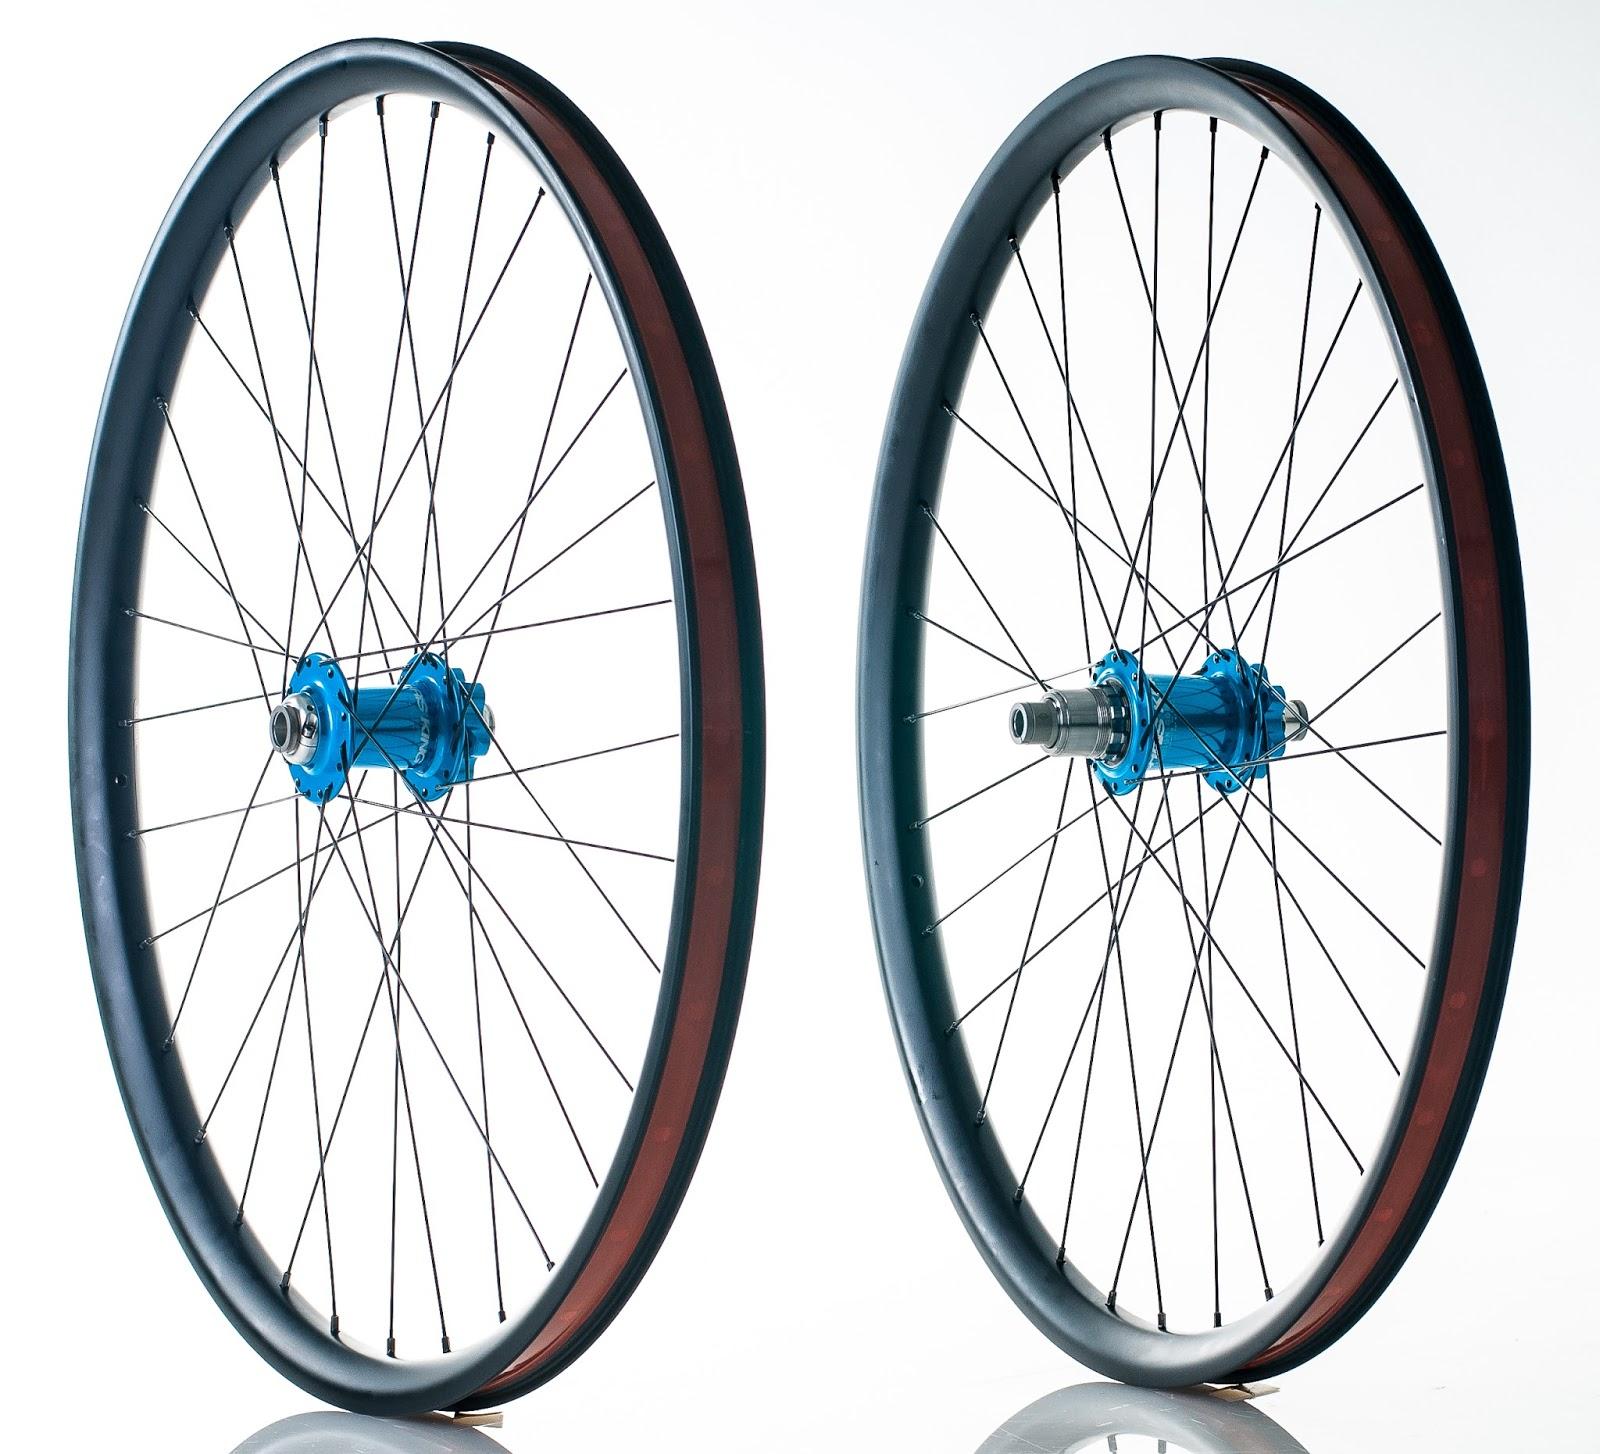 Cycle Monkey Wheel House Tubeless Carbon Mtb Wheelset 27